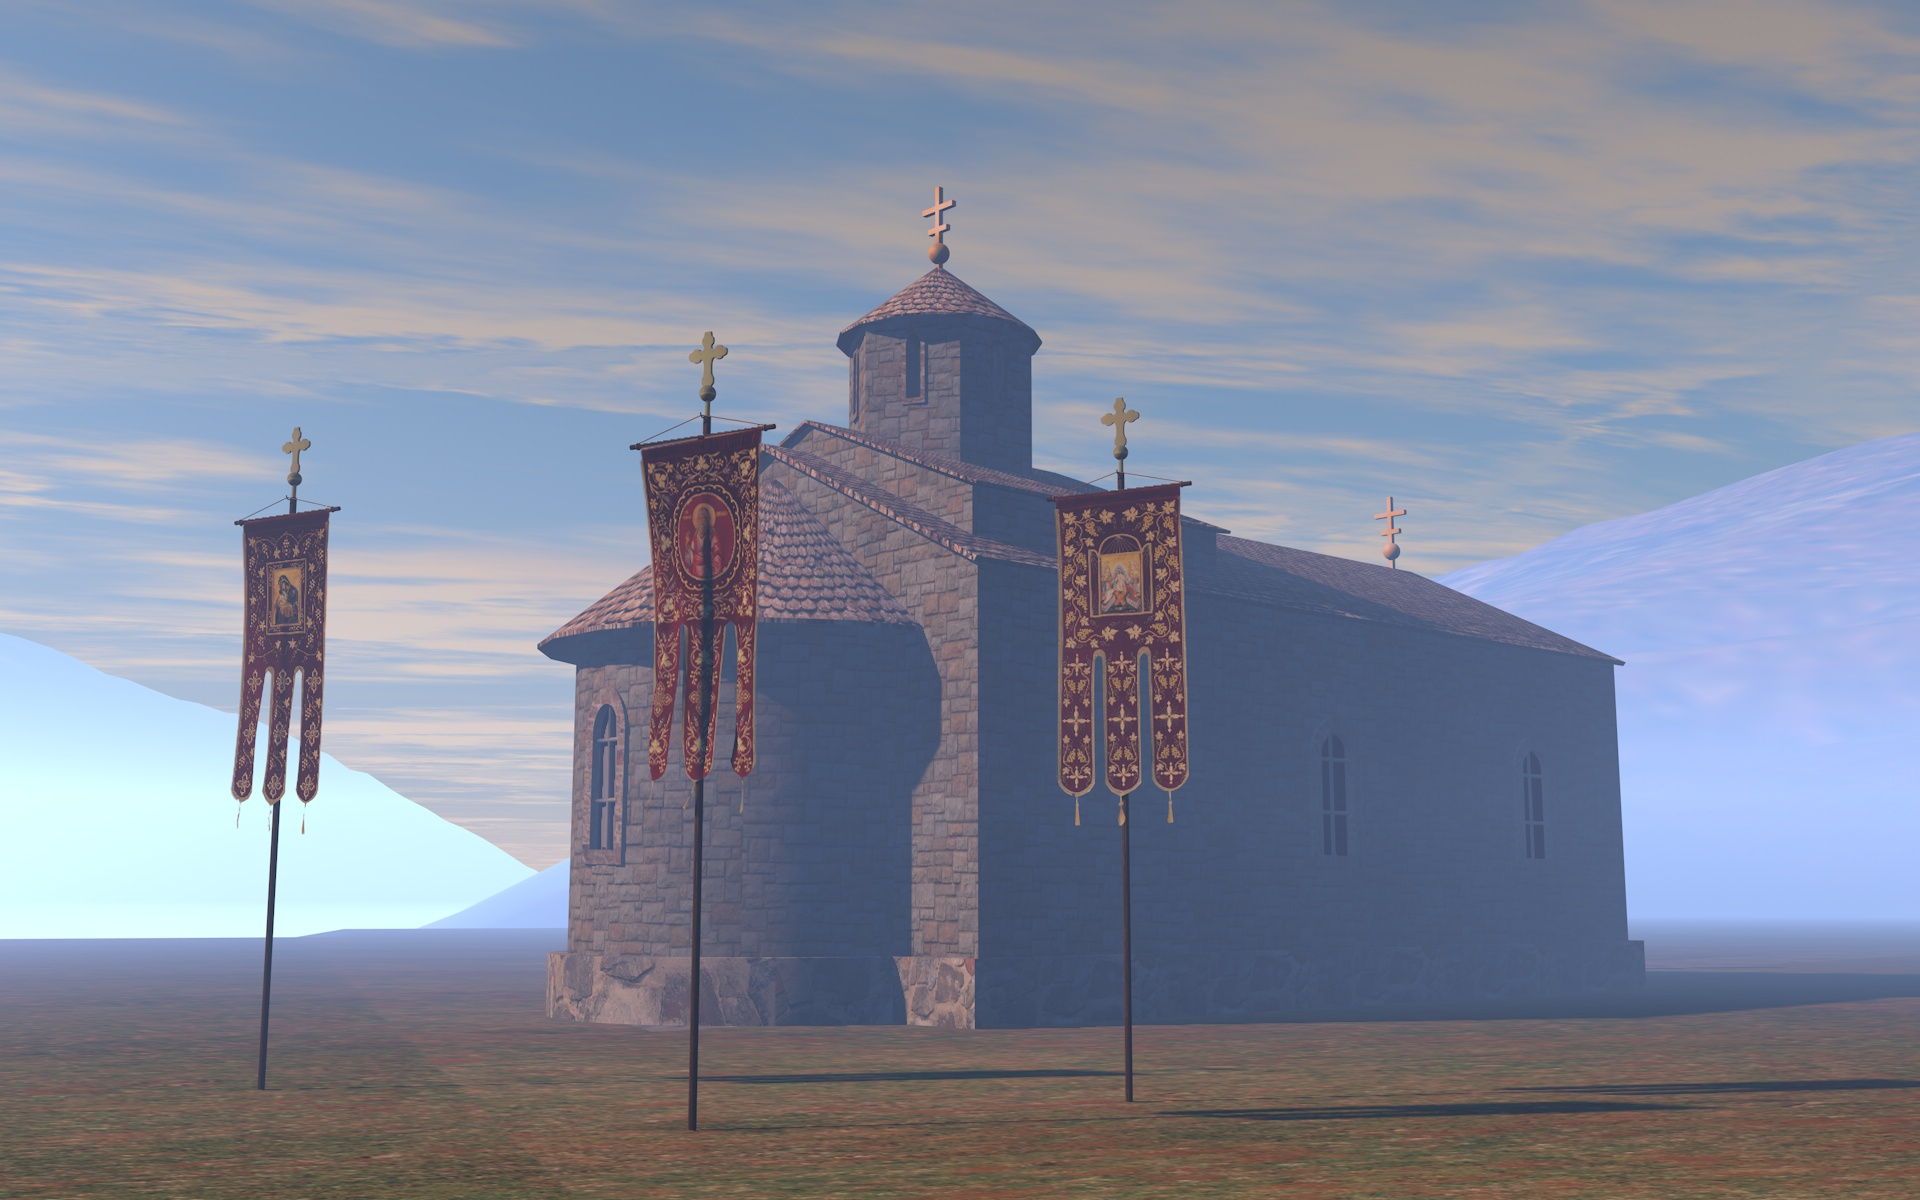 Otkriveni temelji manastira u Rožnju. Rozanj5-A0806